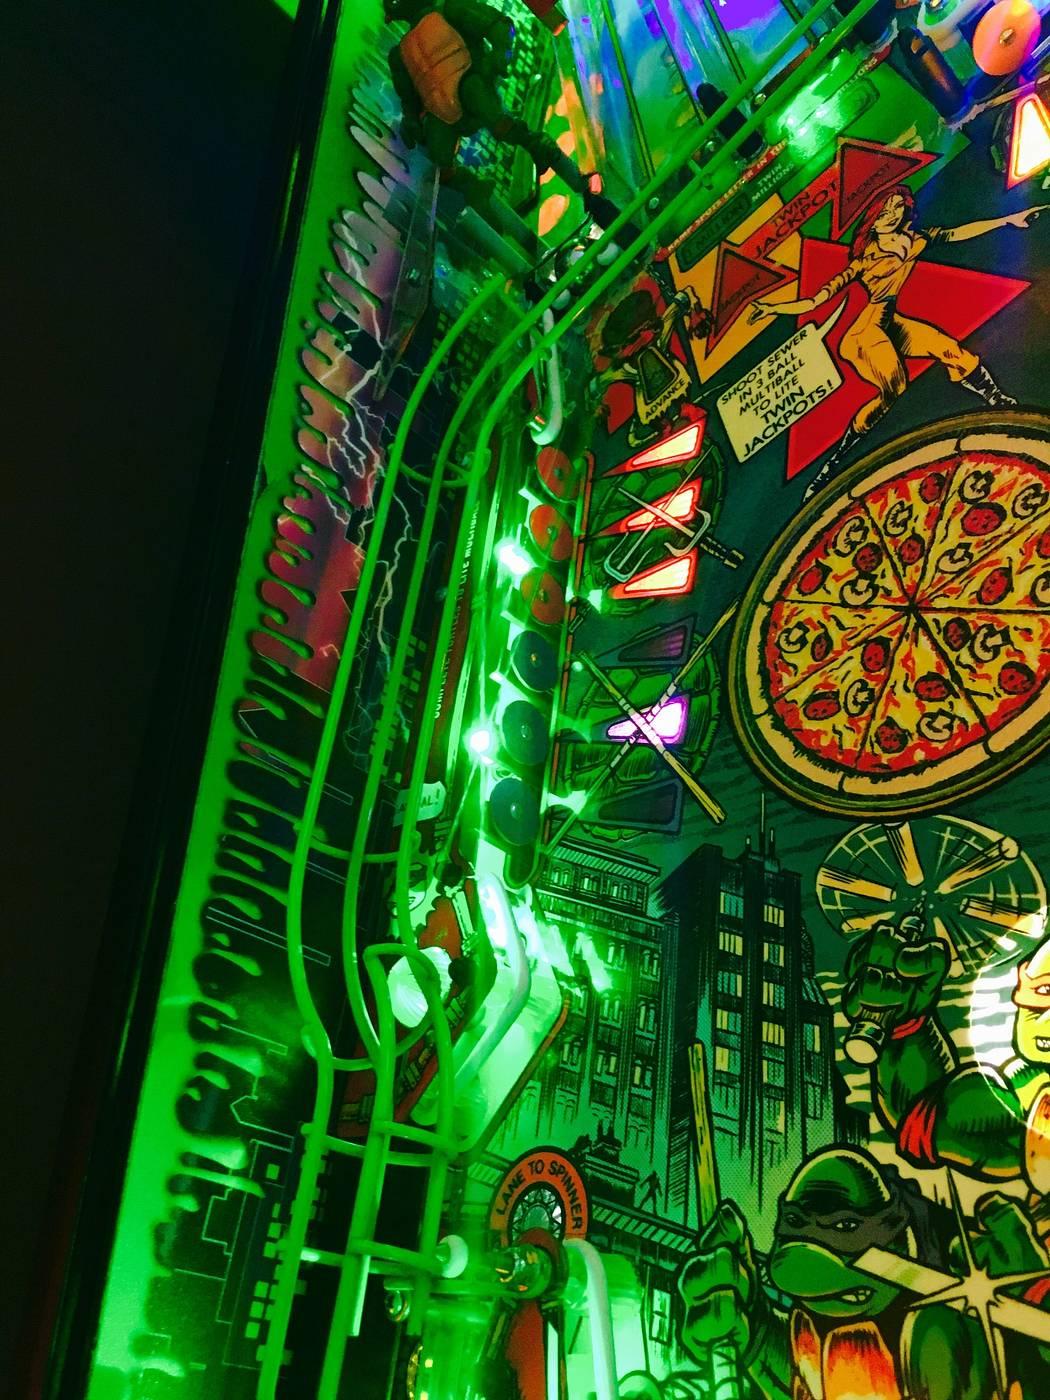 mutant turtles pinball machine for sale